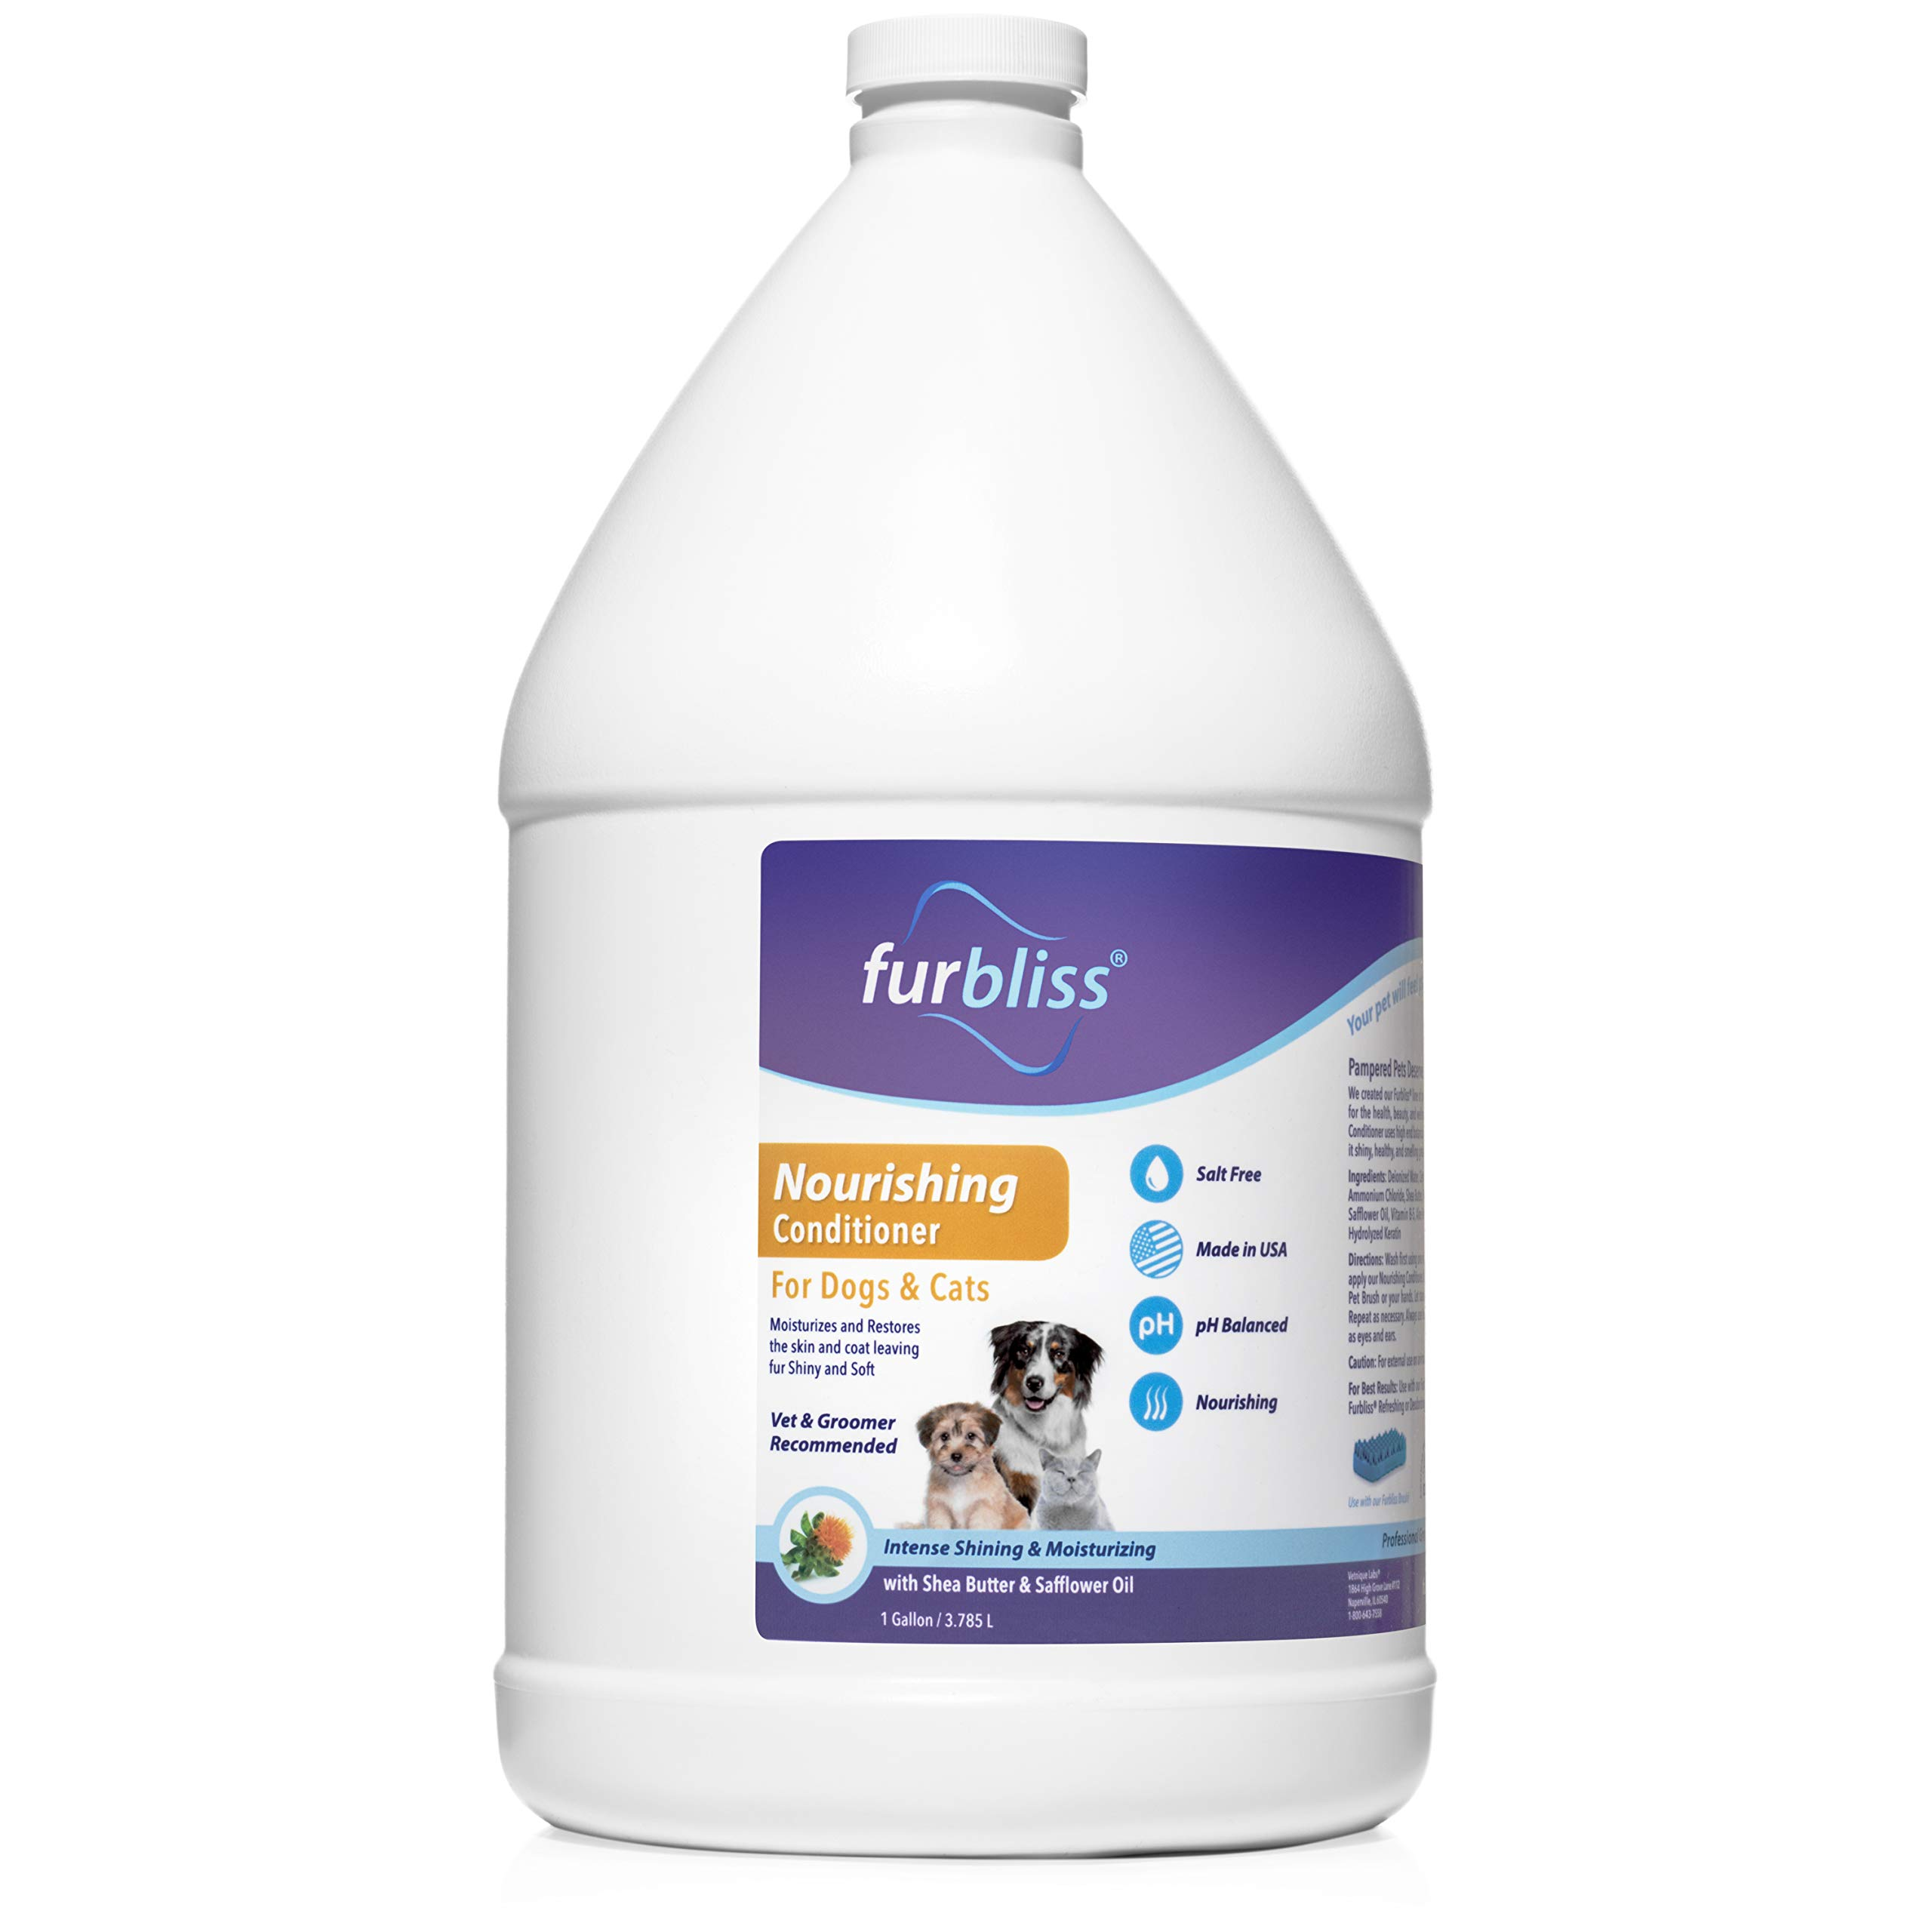 Furbliss Nourishing Dog and Cat Conditioner - Intense Shine & Moisturizing Detangler with Shea Butter & Safflower Oil (Gallon)